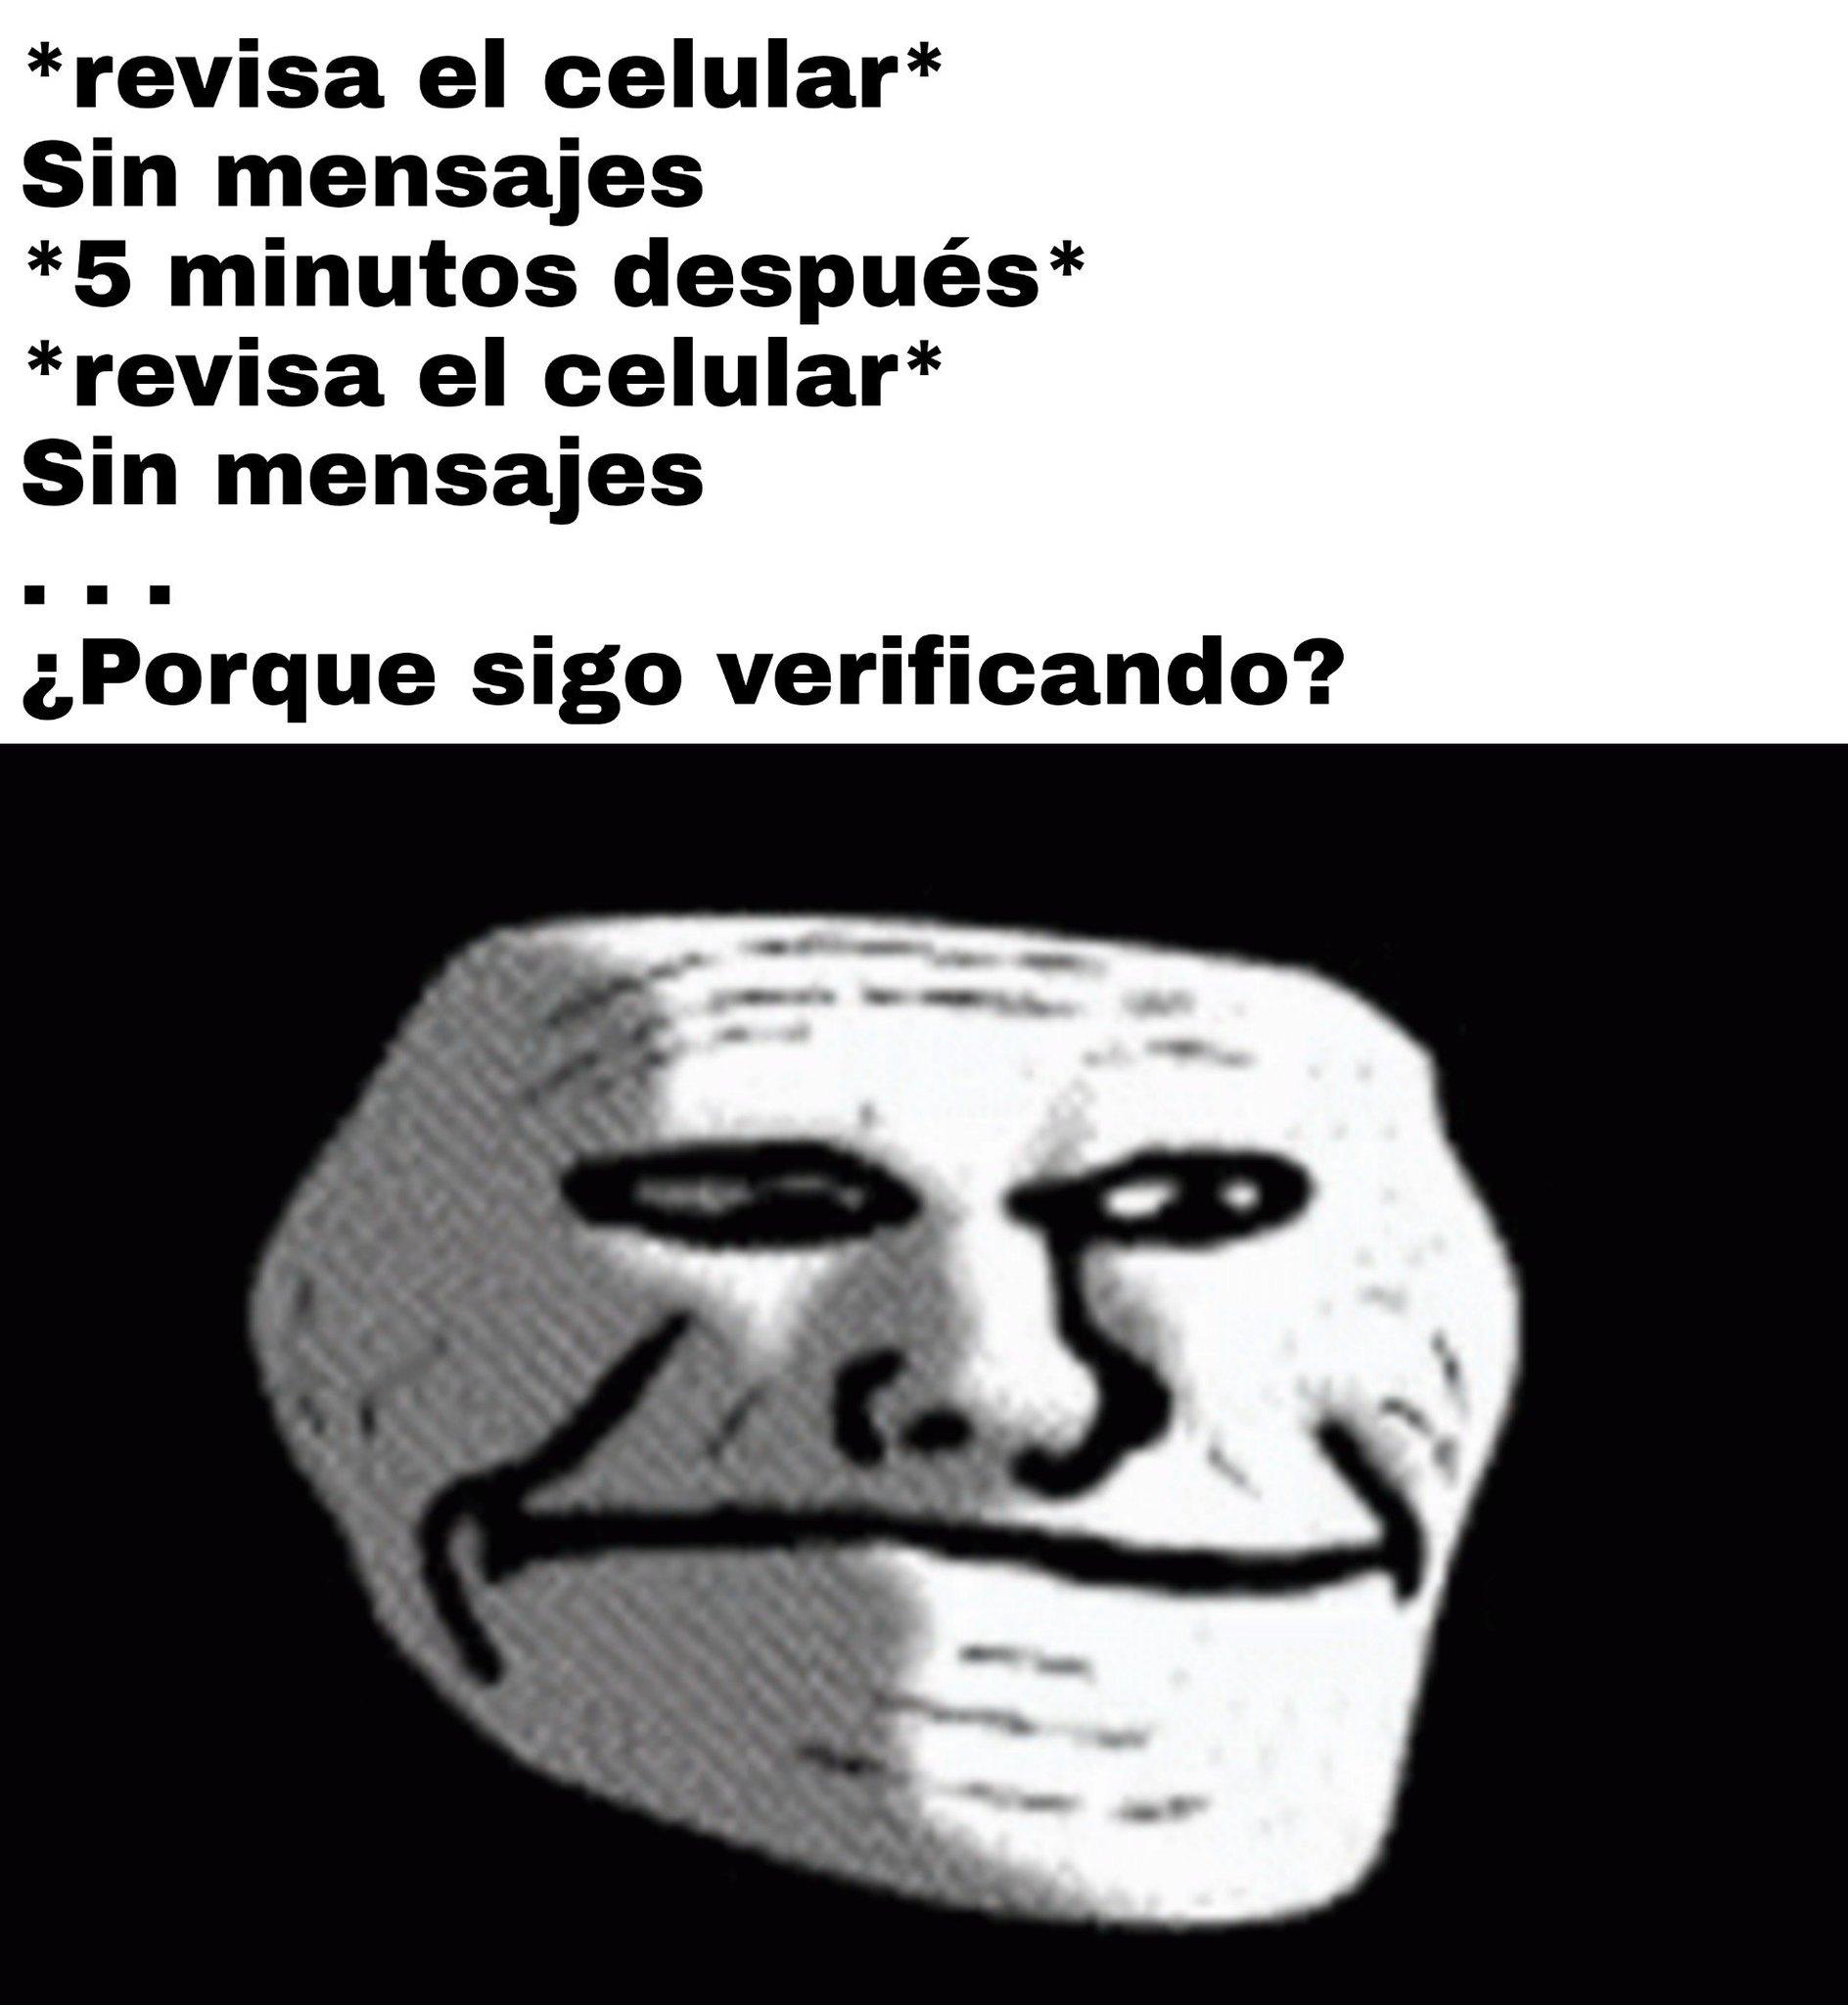 Carita triste - meme